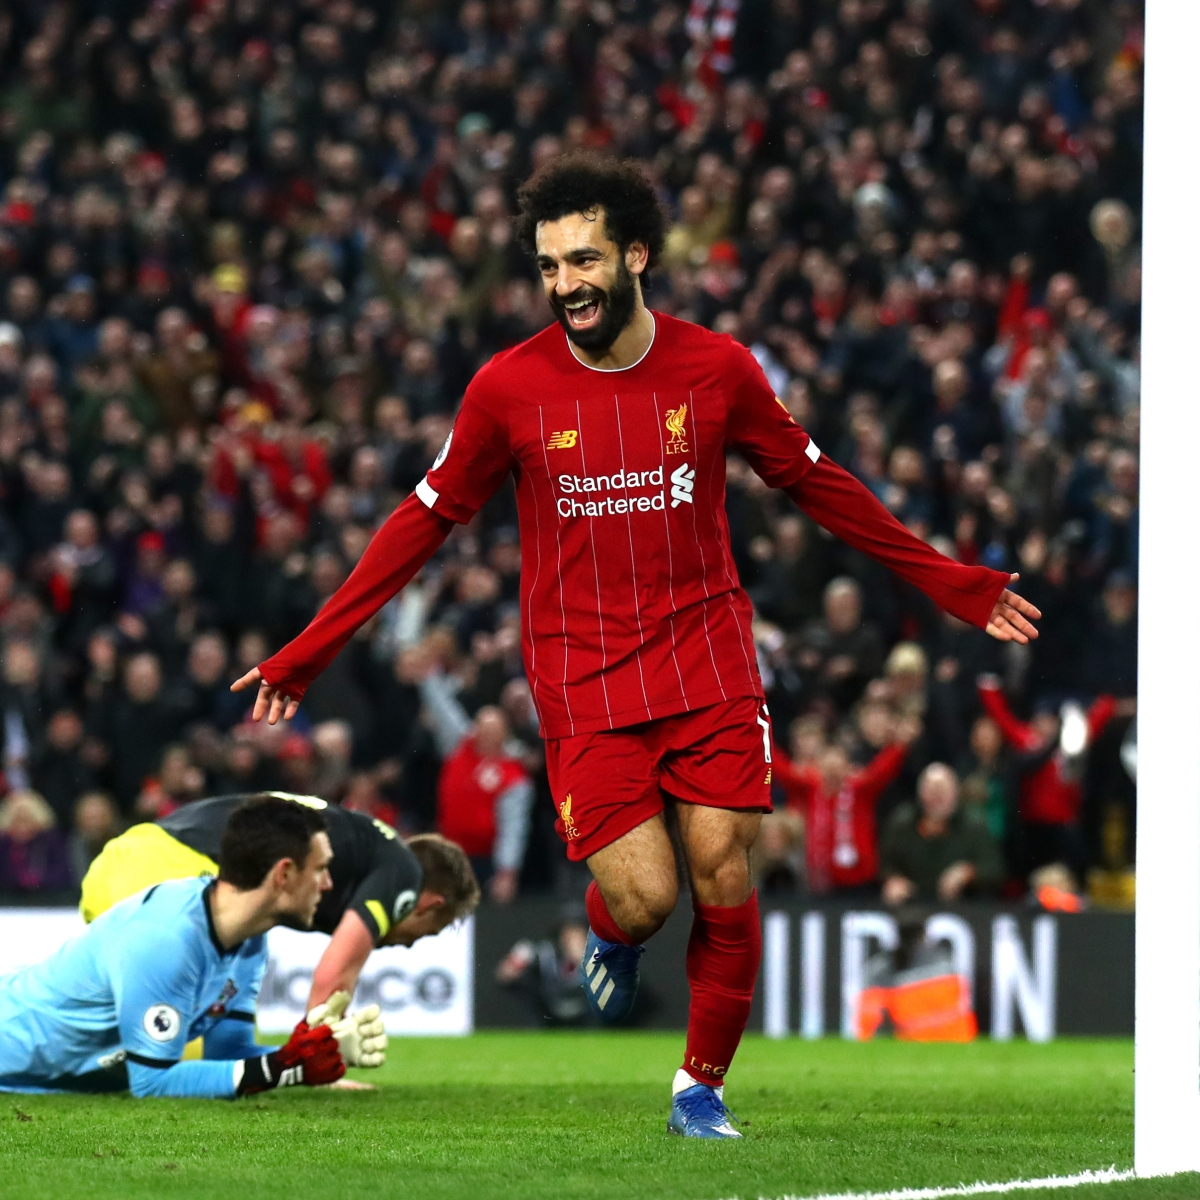 Mohamed Salah overtakes Steven Gerrard to become Liverpool's highest, fastest Champions League goalscorer